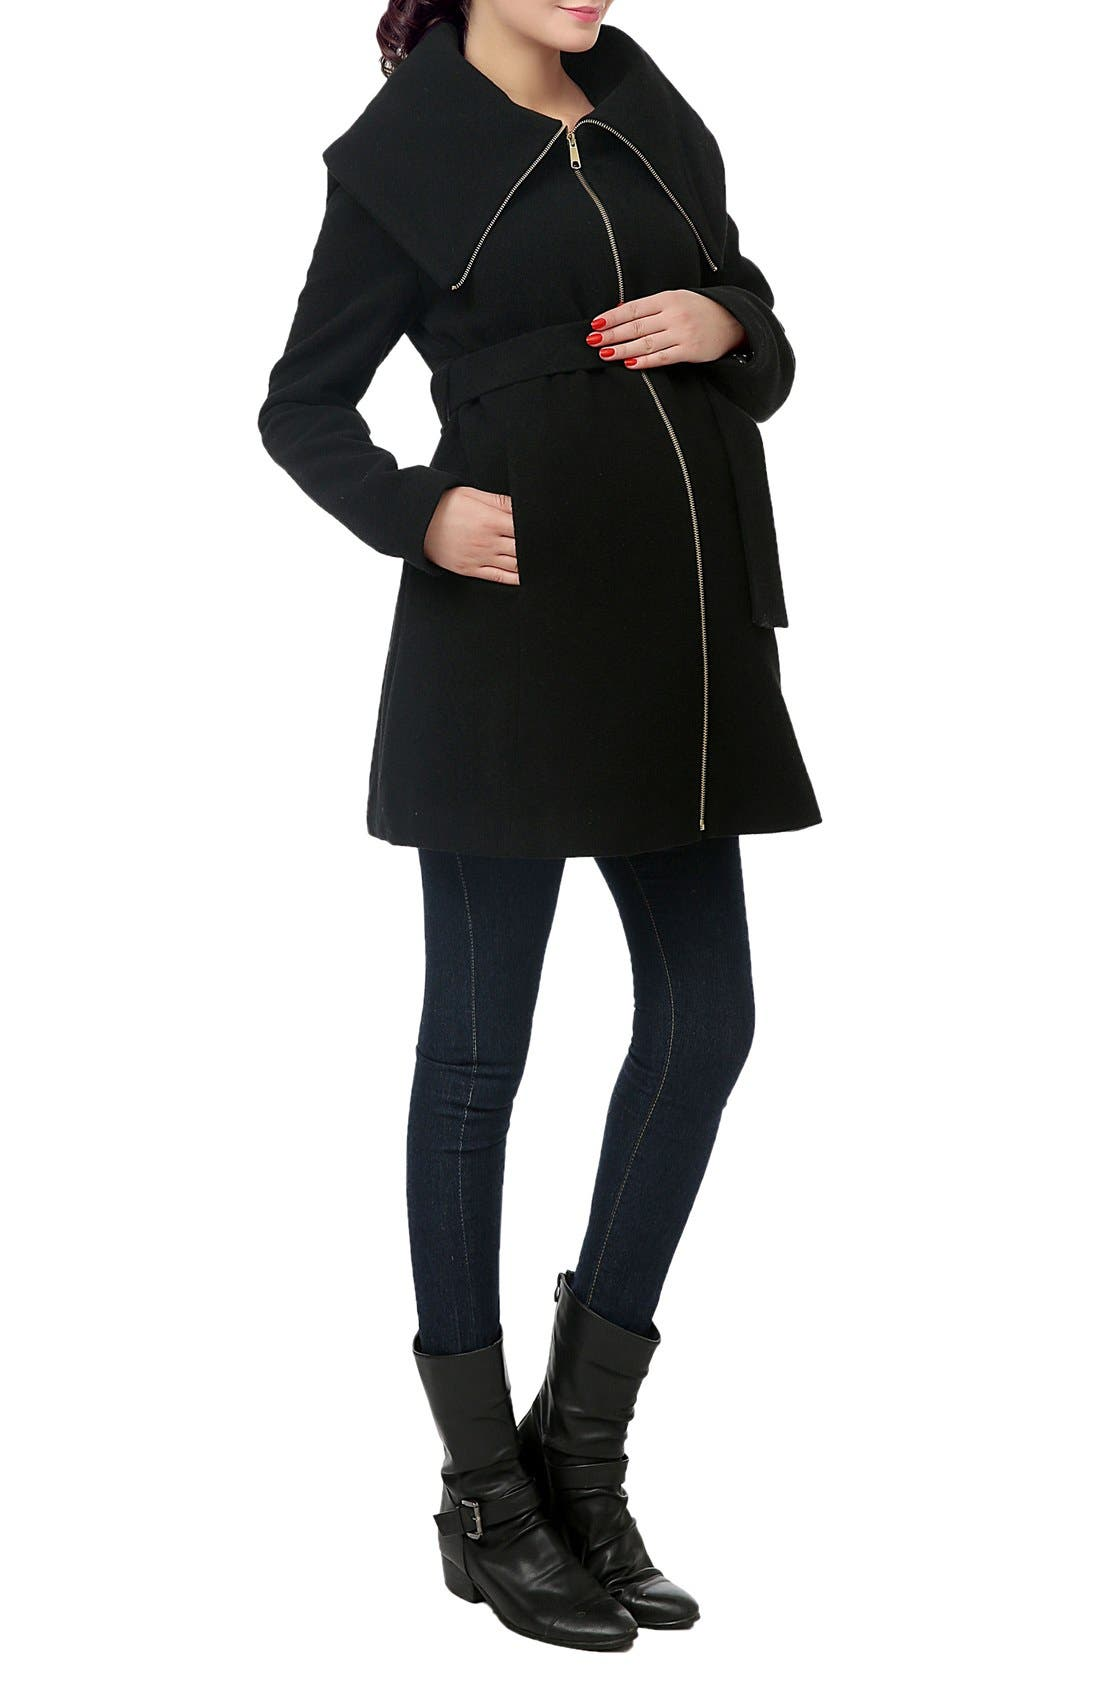 'Mia' High Collar Maternity Coat,                             Alternate thumbnail 3, color,                             BLACK